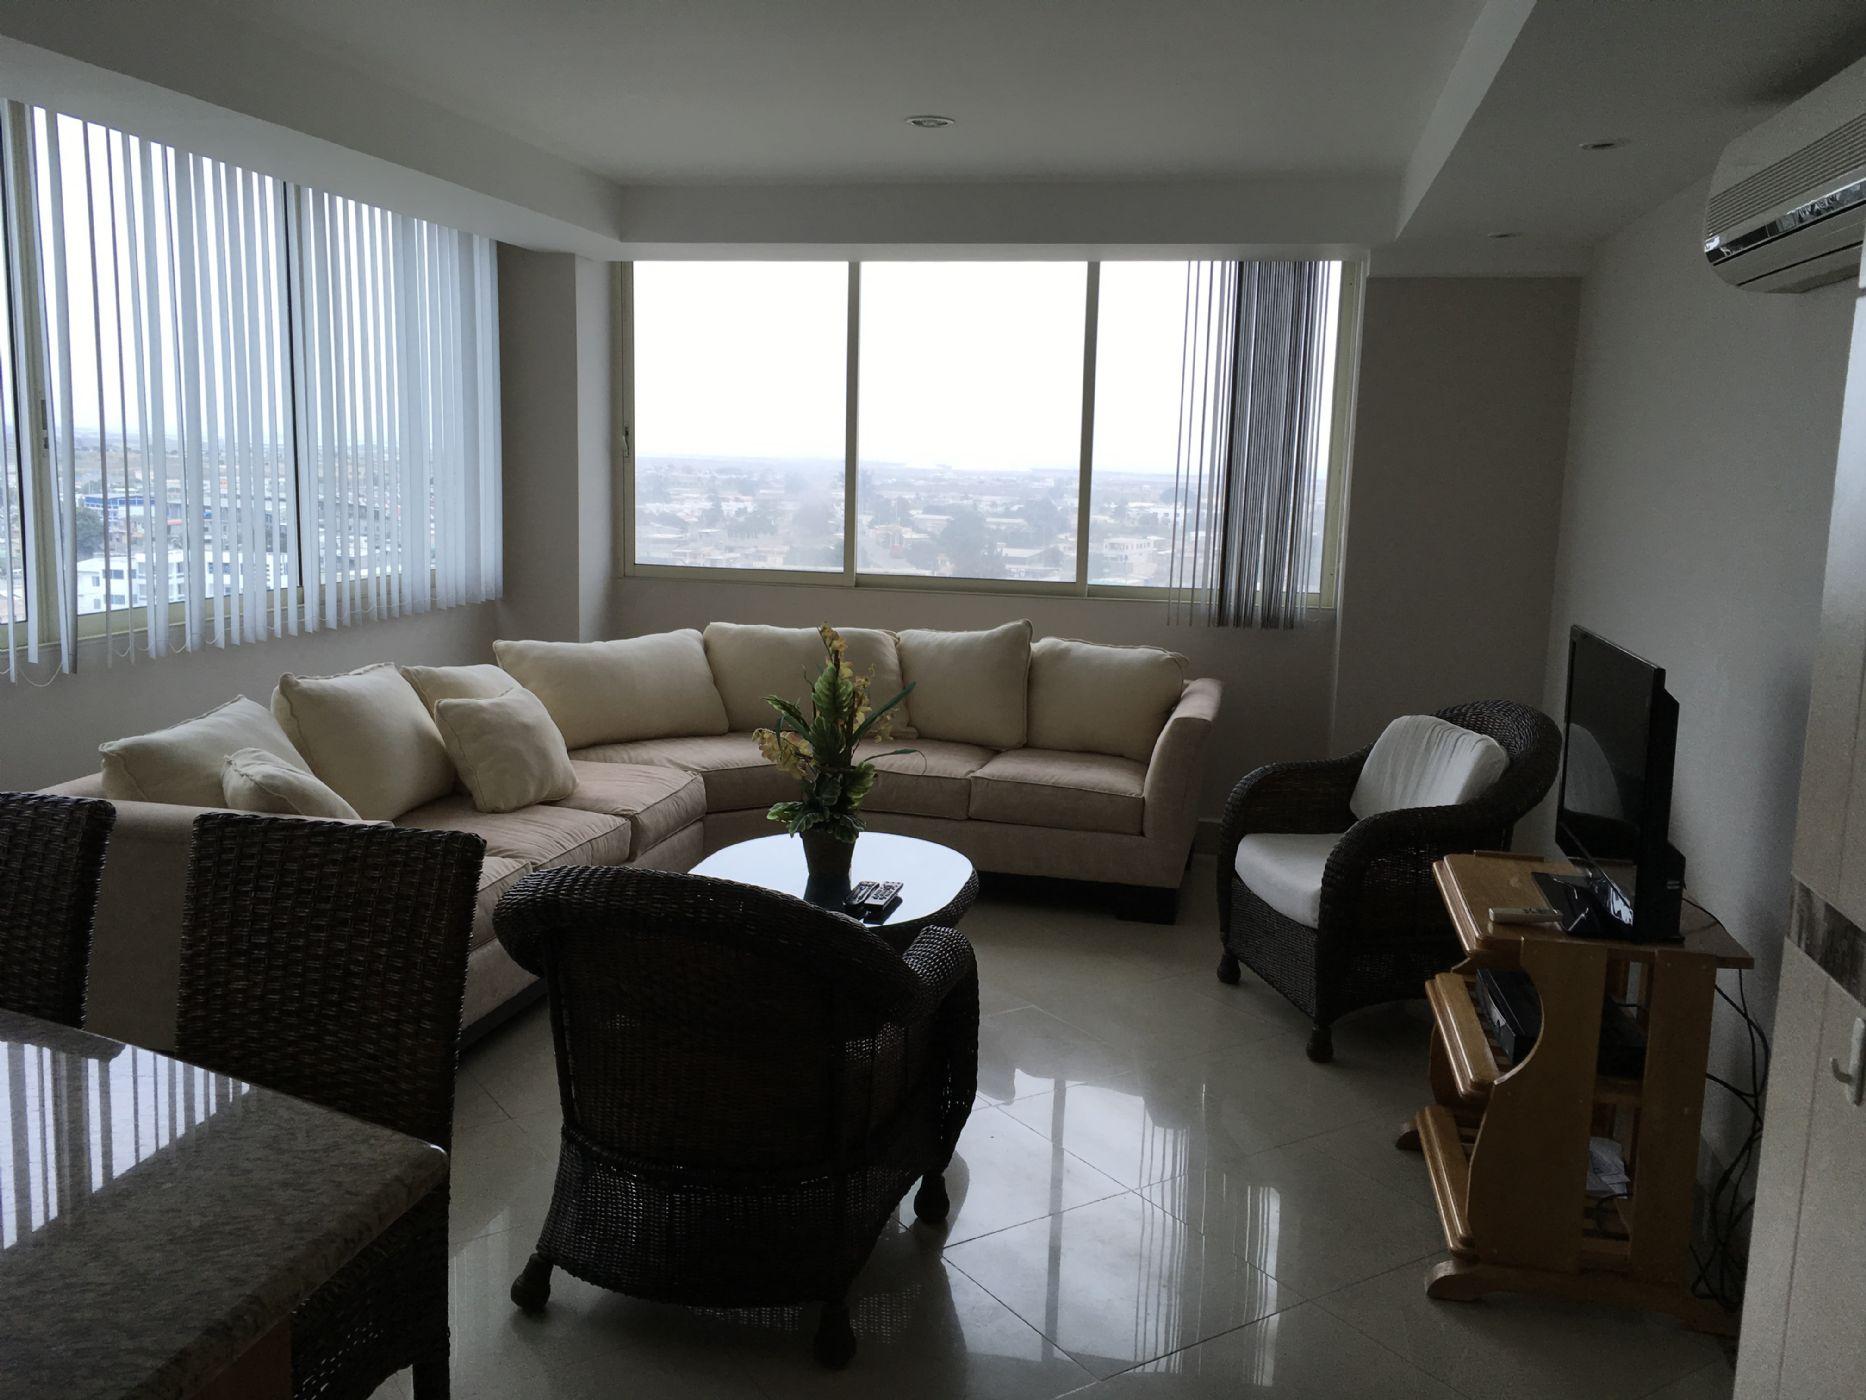 Salinas-Ecuador-property-511868-2.JPG